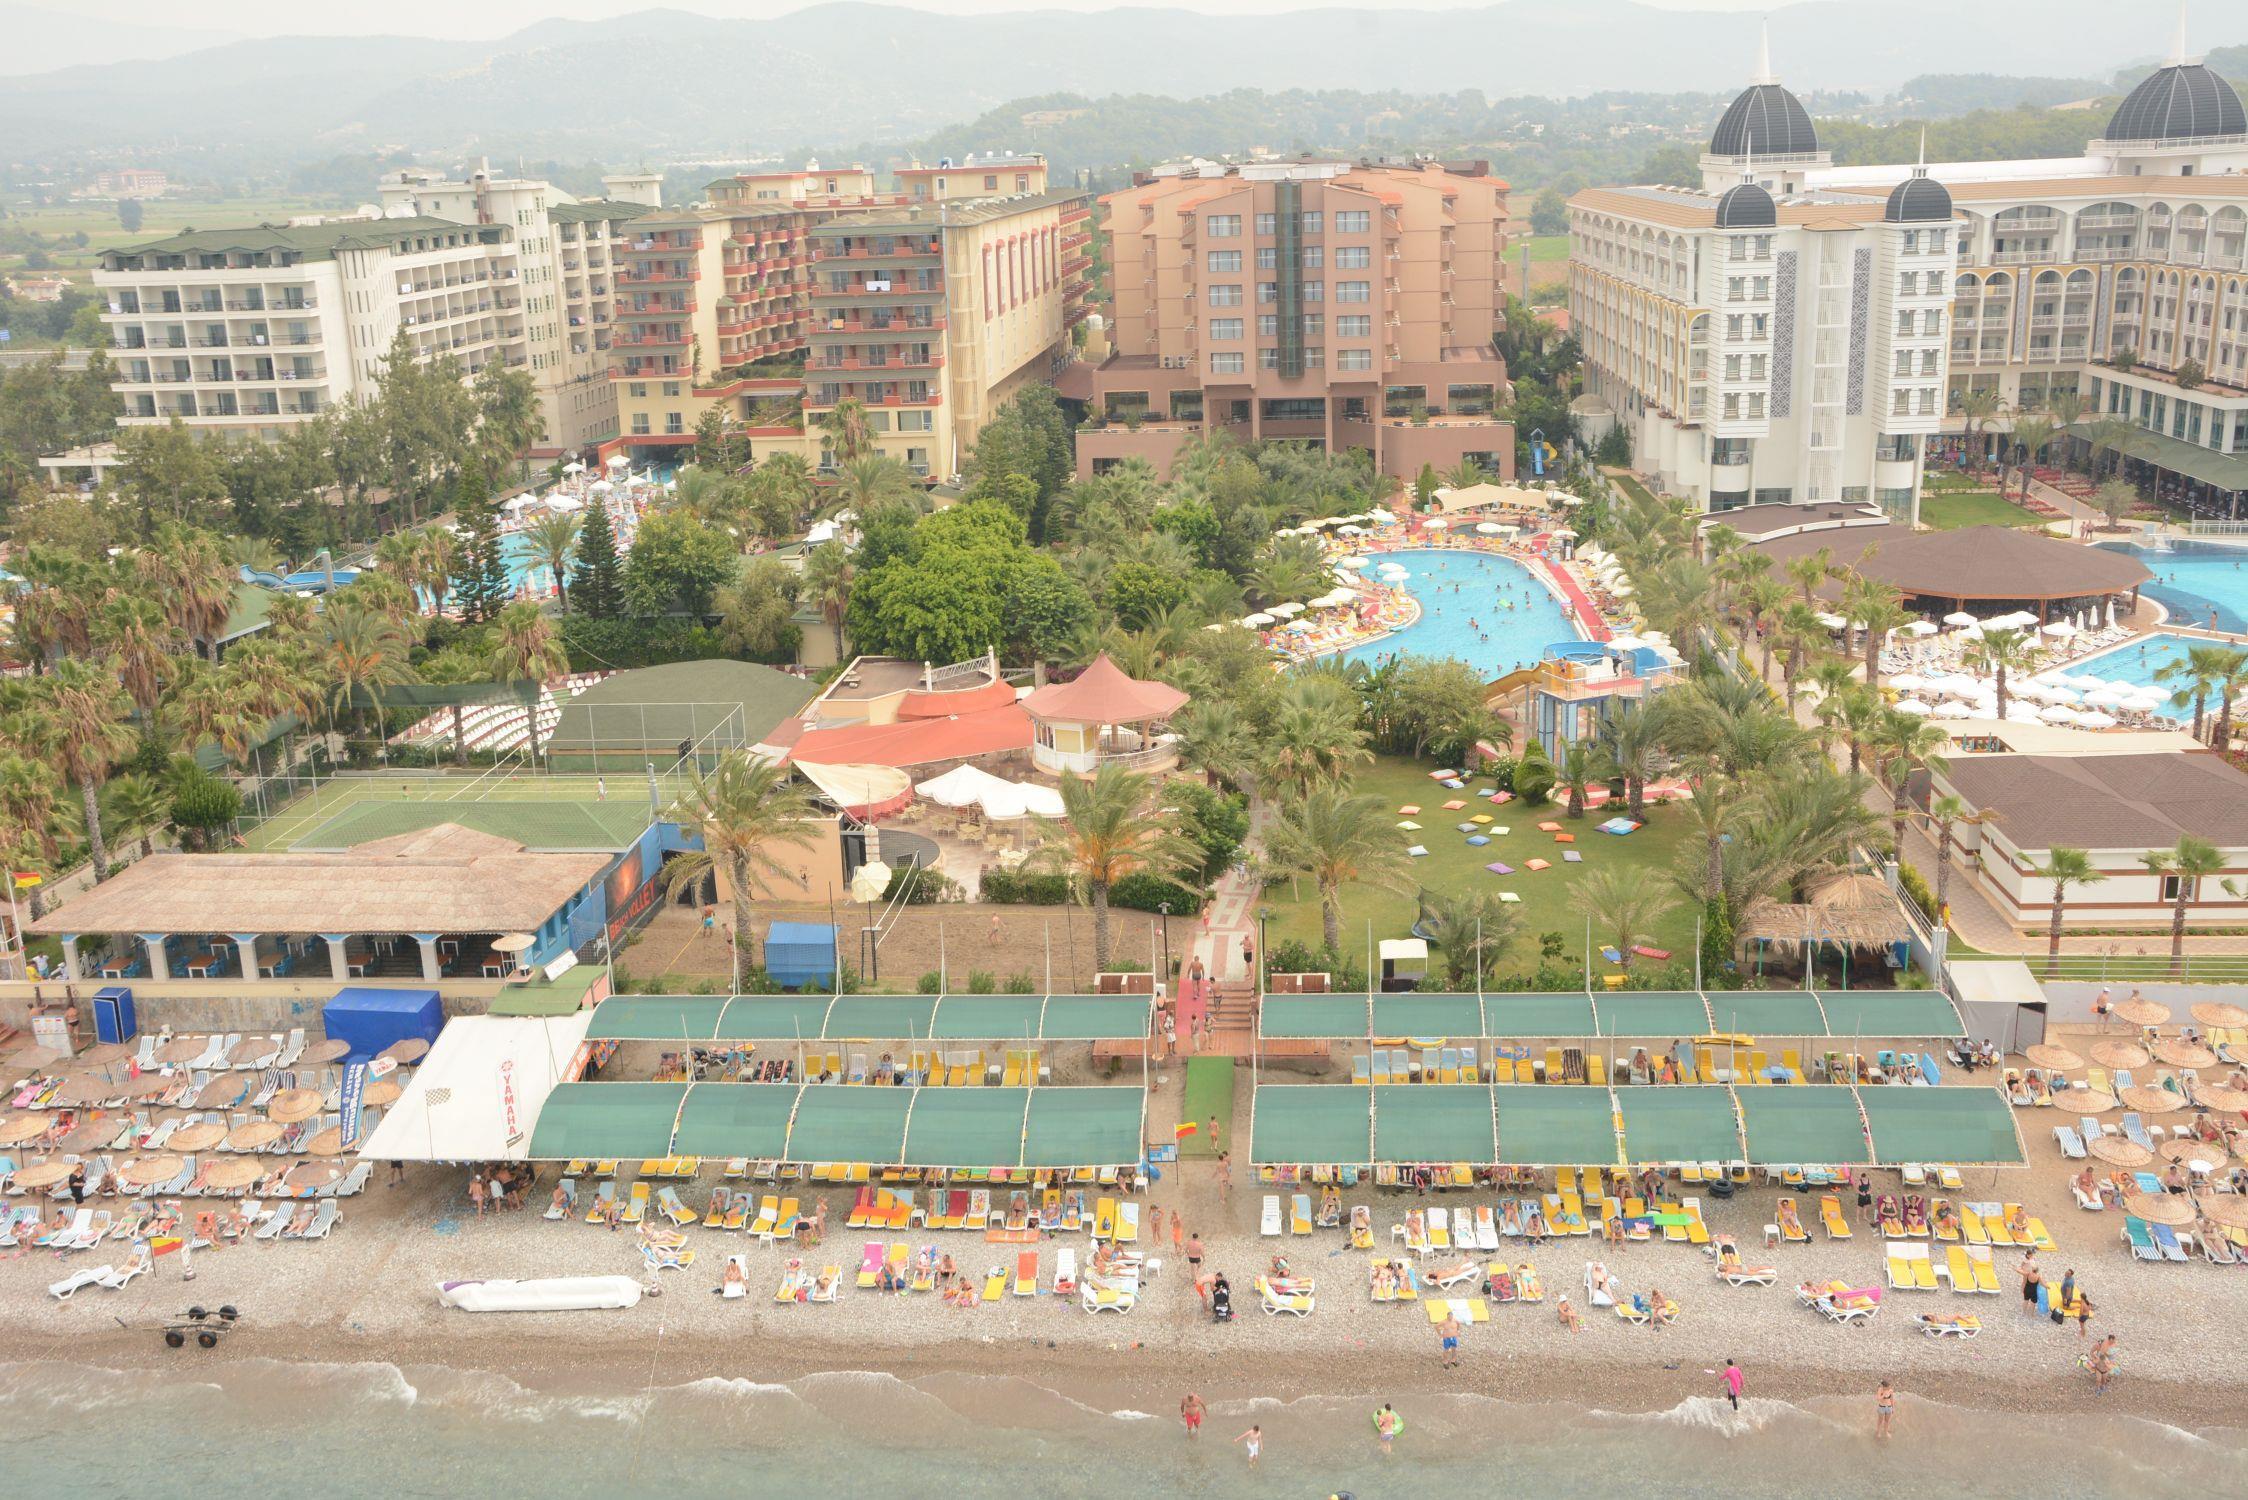 http://www.orextravel.sk/OREX/hotelphotos/stella-beach-hotel-alanya-general-0010.jpg